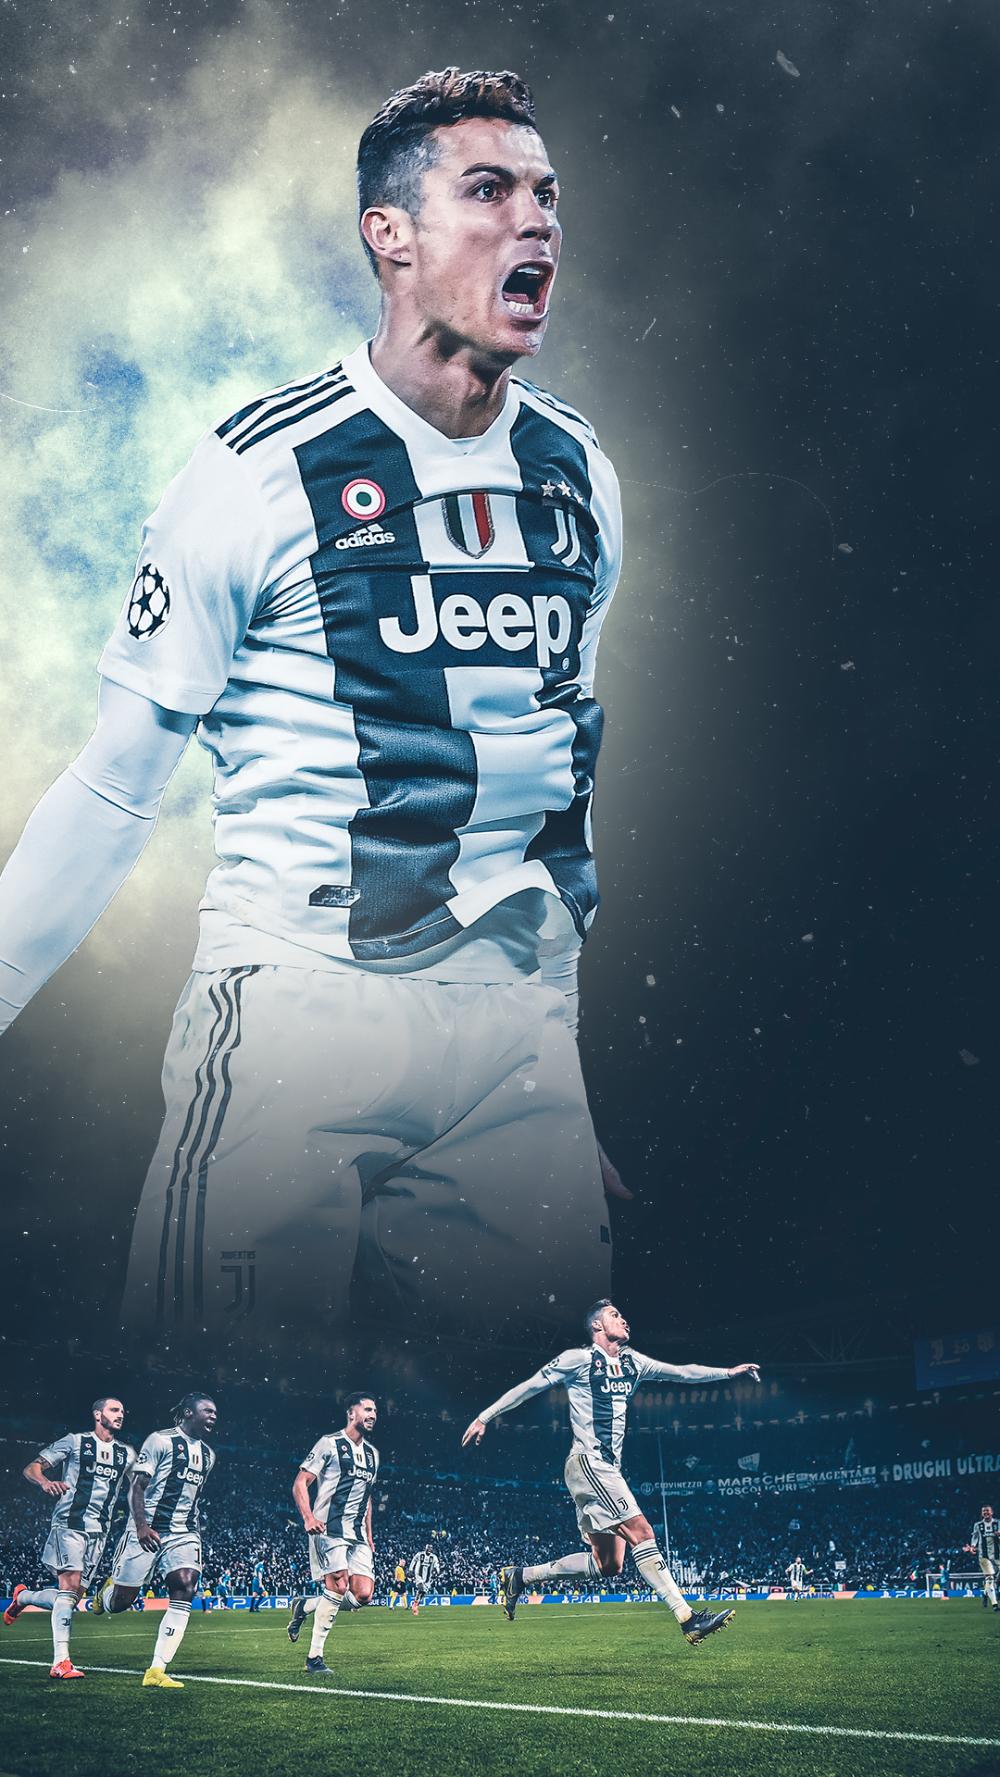 Messi And Pogba Pogba Y Messi Cristiano Ronaldo Wallpapers Ronaldo Wallpapers Cristiano Ronaldo Juventus